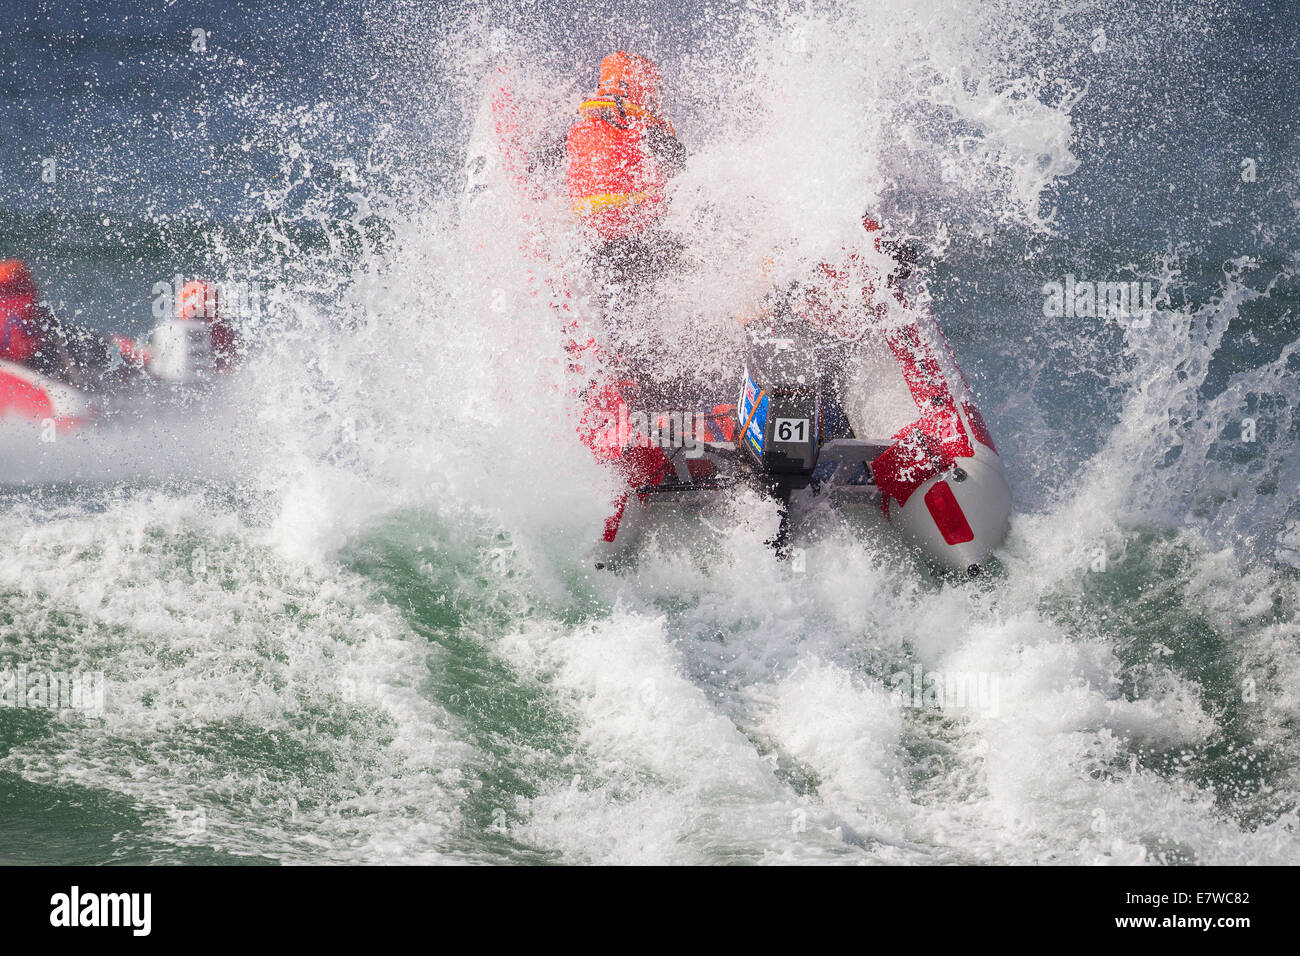 Thundercat Racing, Fistral Strand, Newquay, Cornwall UK Stockbild